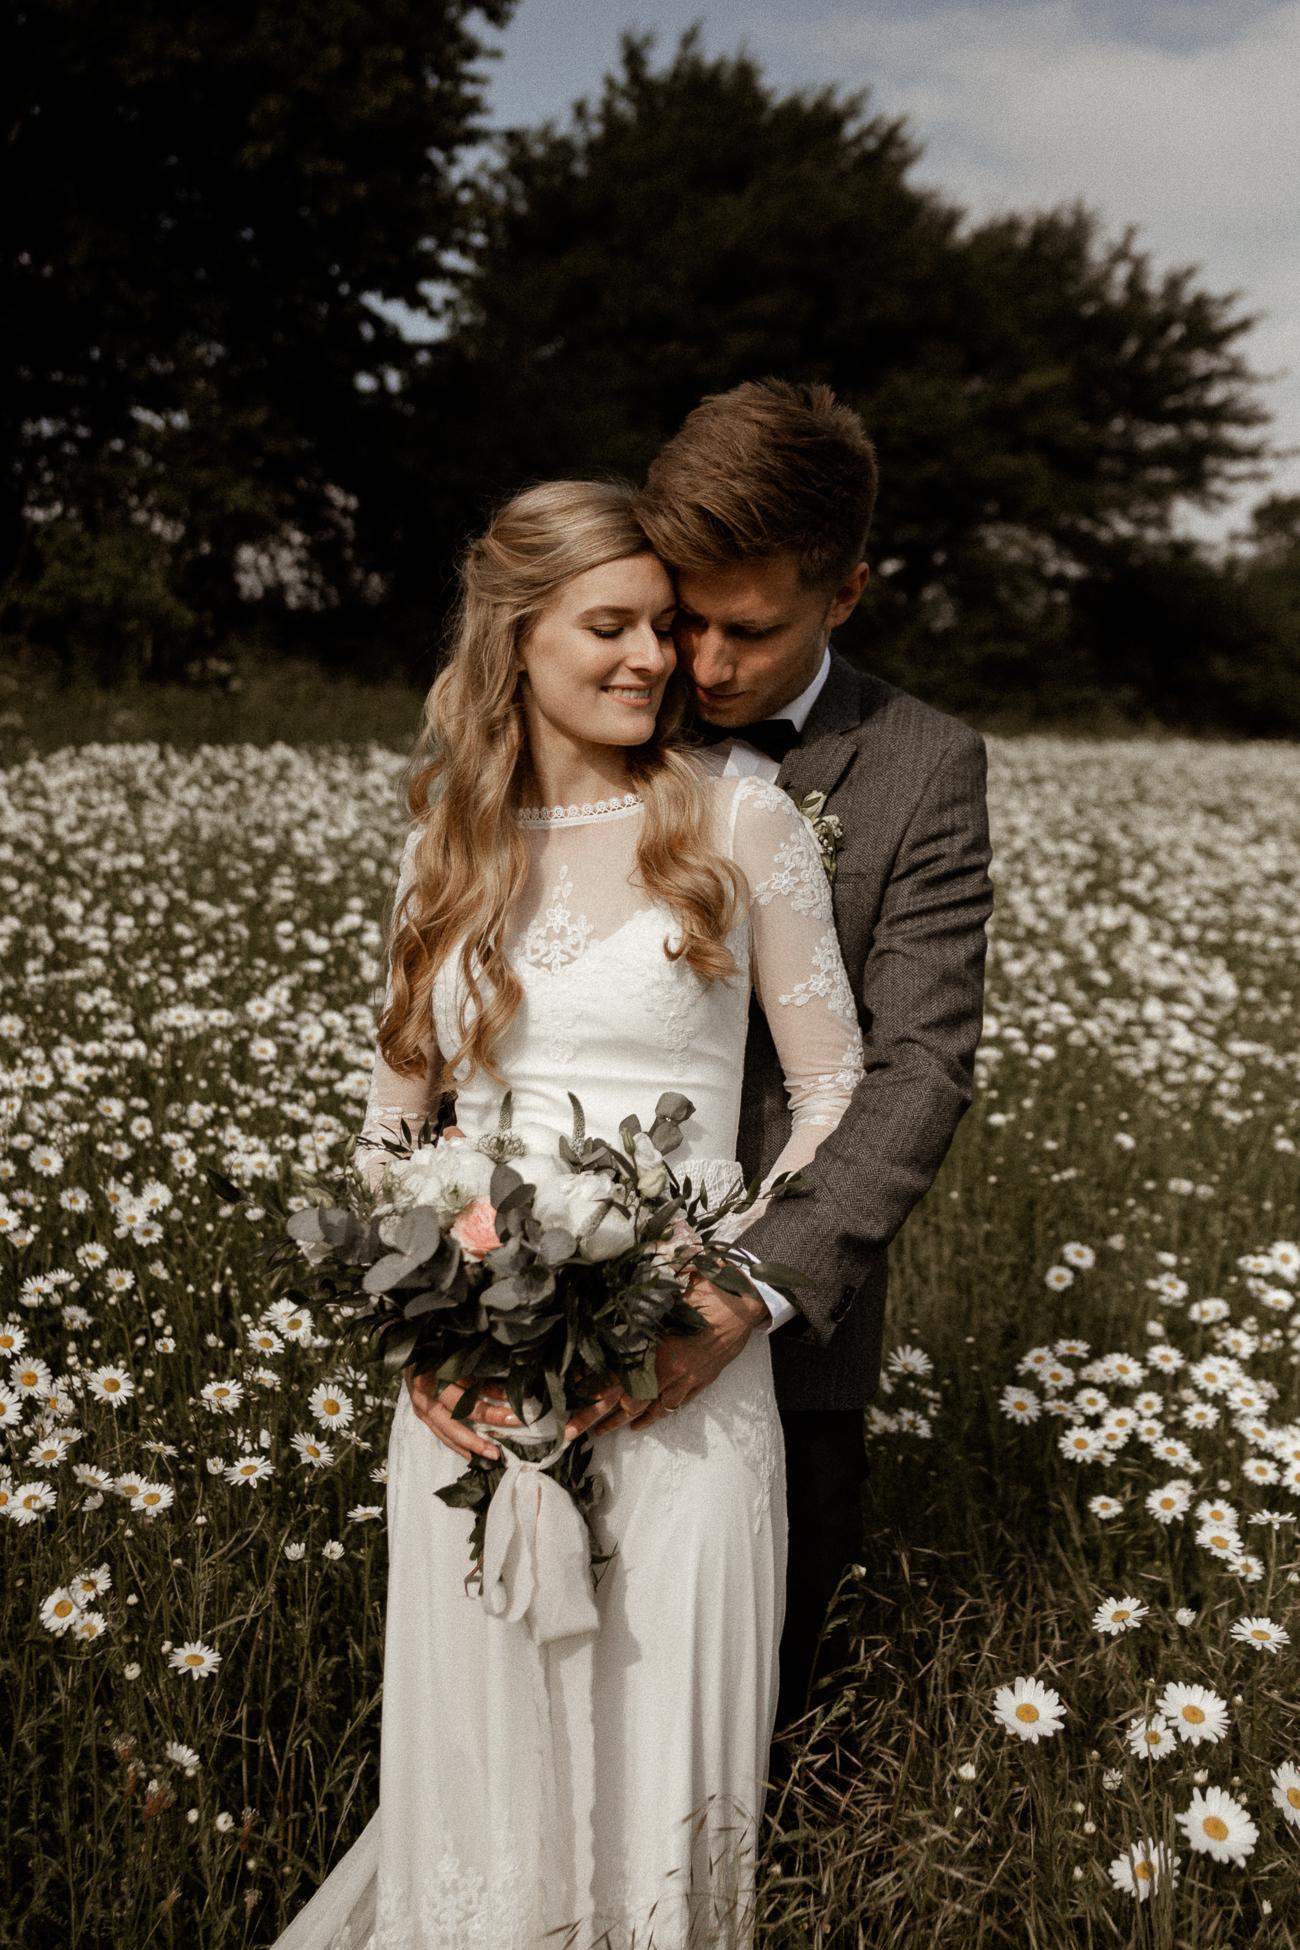 wholeheartedweddings-Timo-Matthies-Sean&Judy-boho-Barnweddings-hochformat-007.jpg